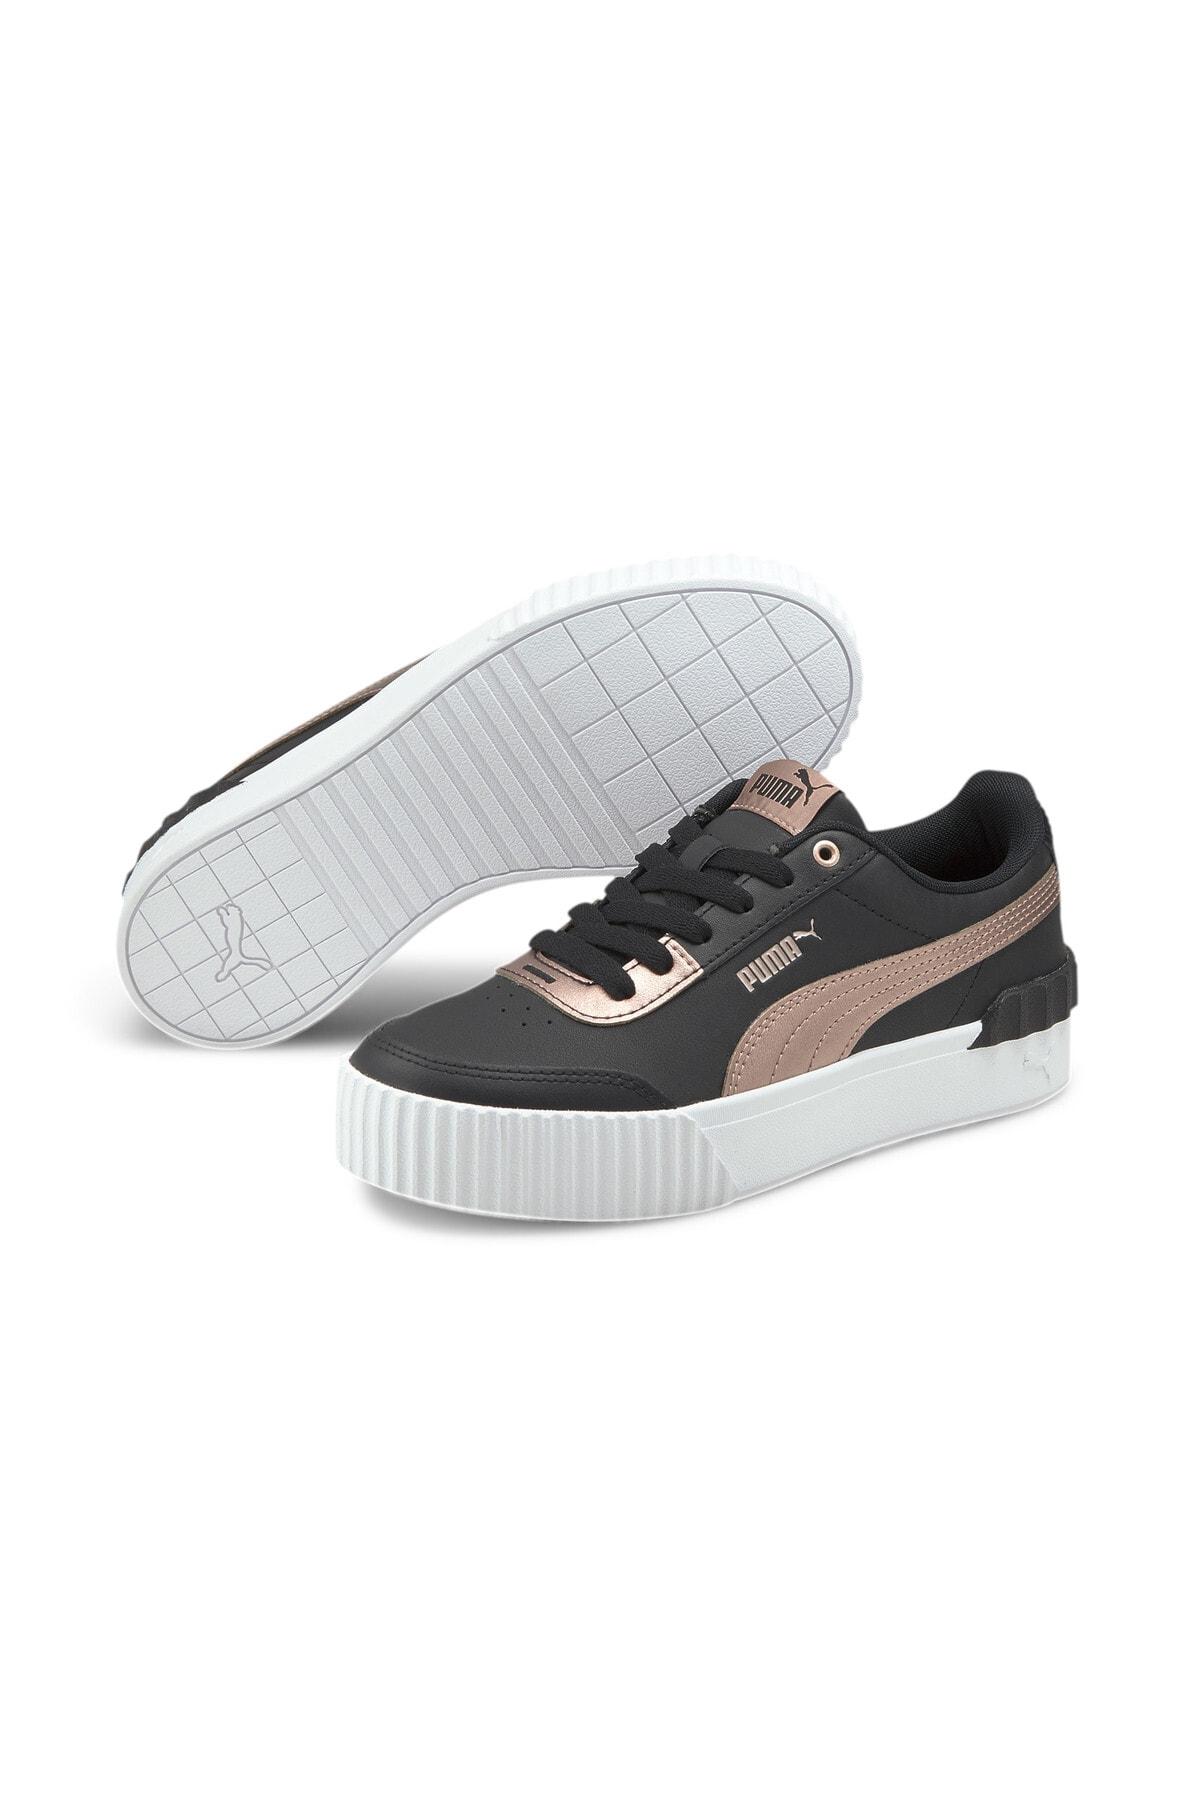 Puma Kadın Sneaker - CARINA LIFT METALLIC - 37599502 1